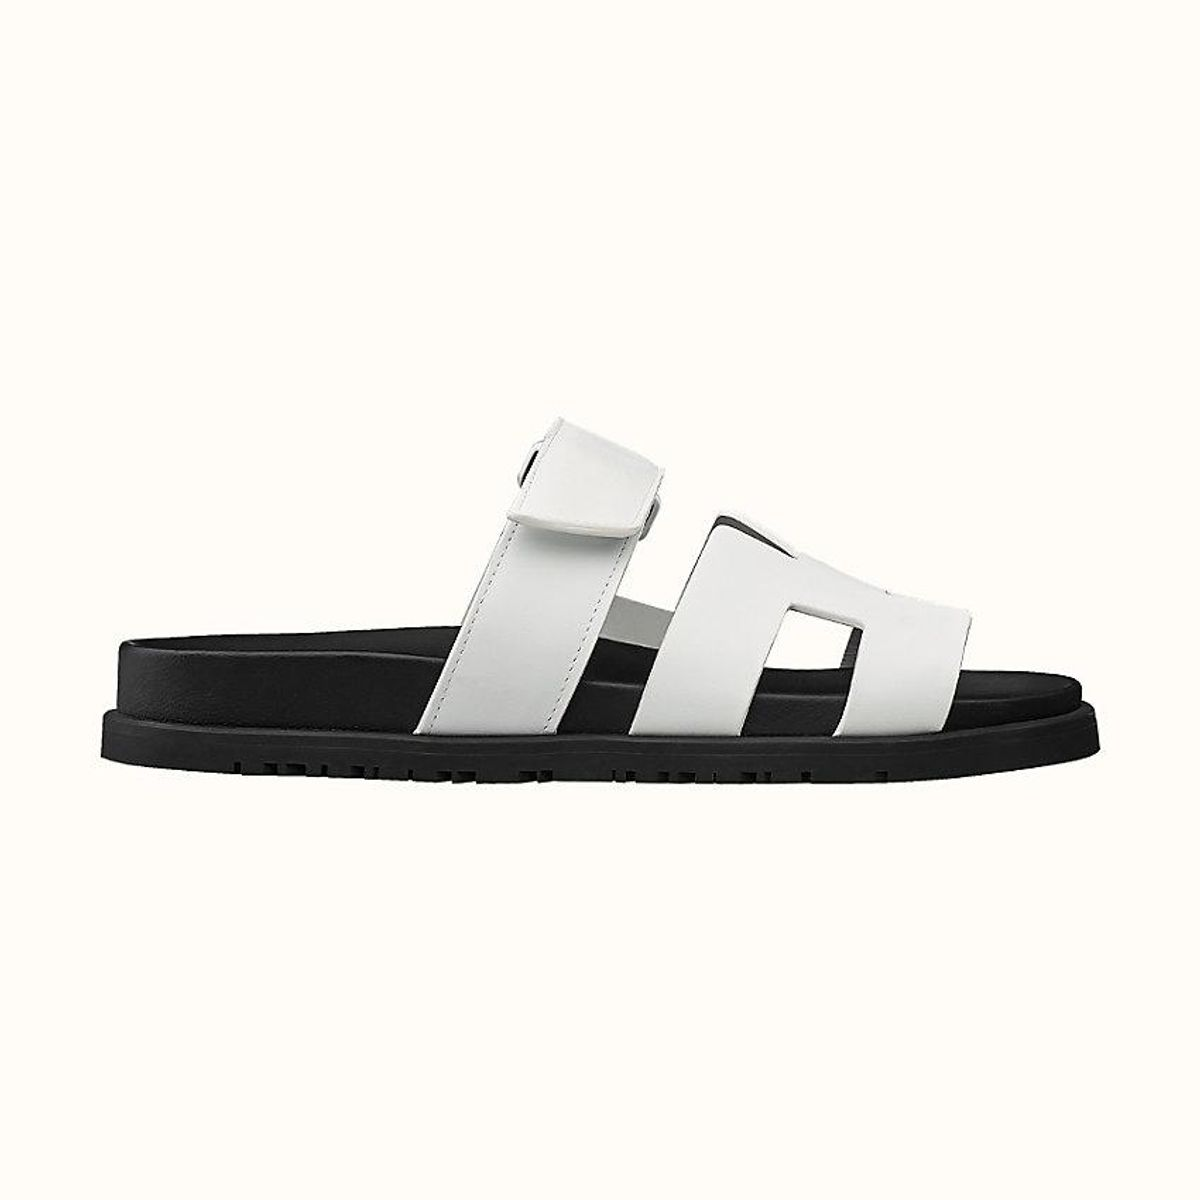 hermes chypre sandal